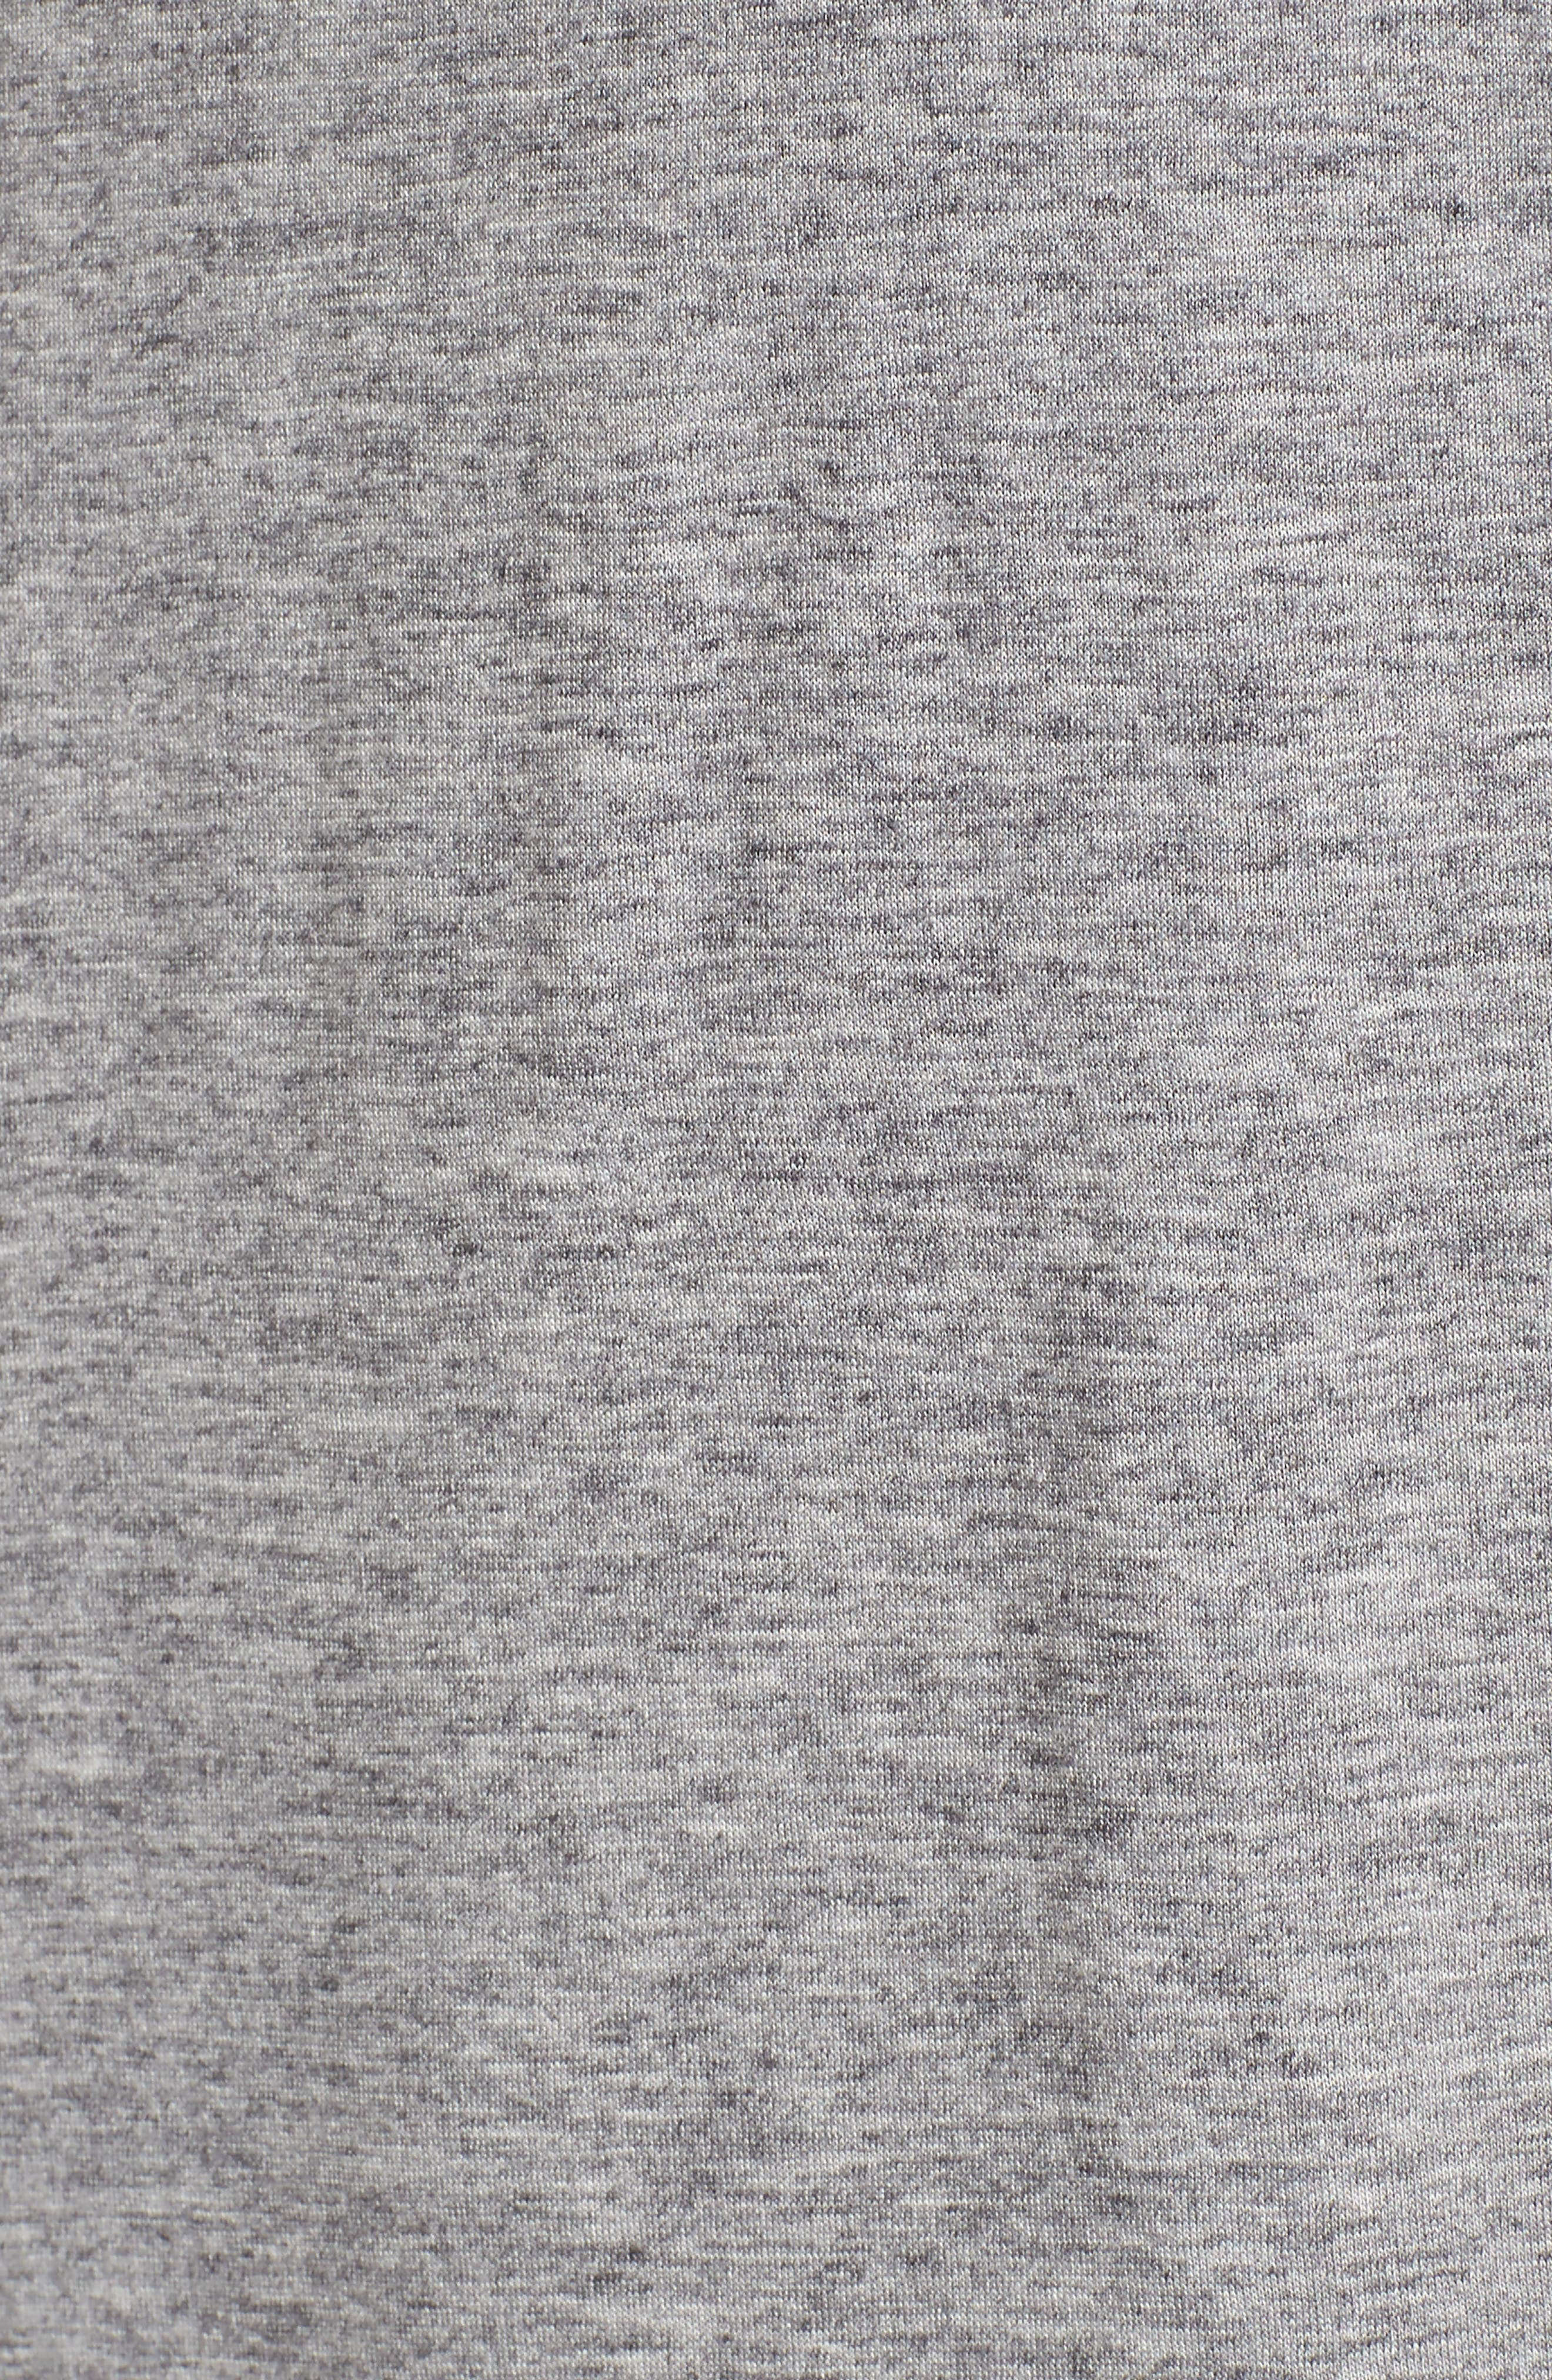 Lightweight Turtleneck Sweater,                             Alternate thumbnail 5, color,                             Grey Melange